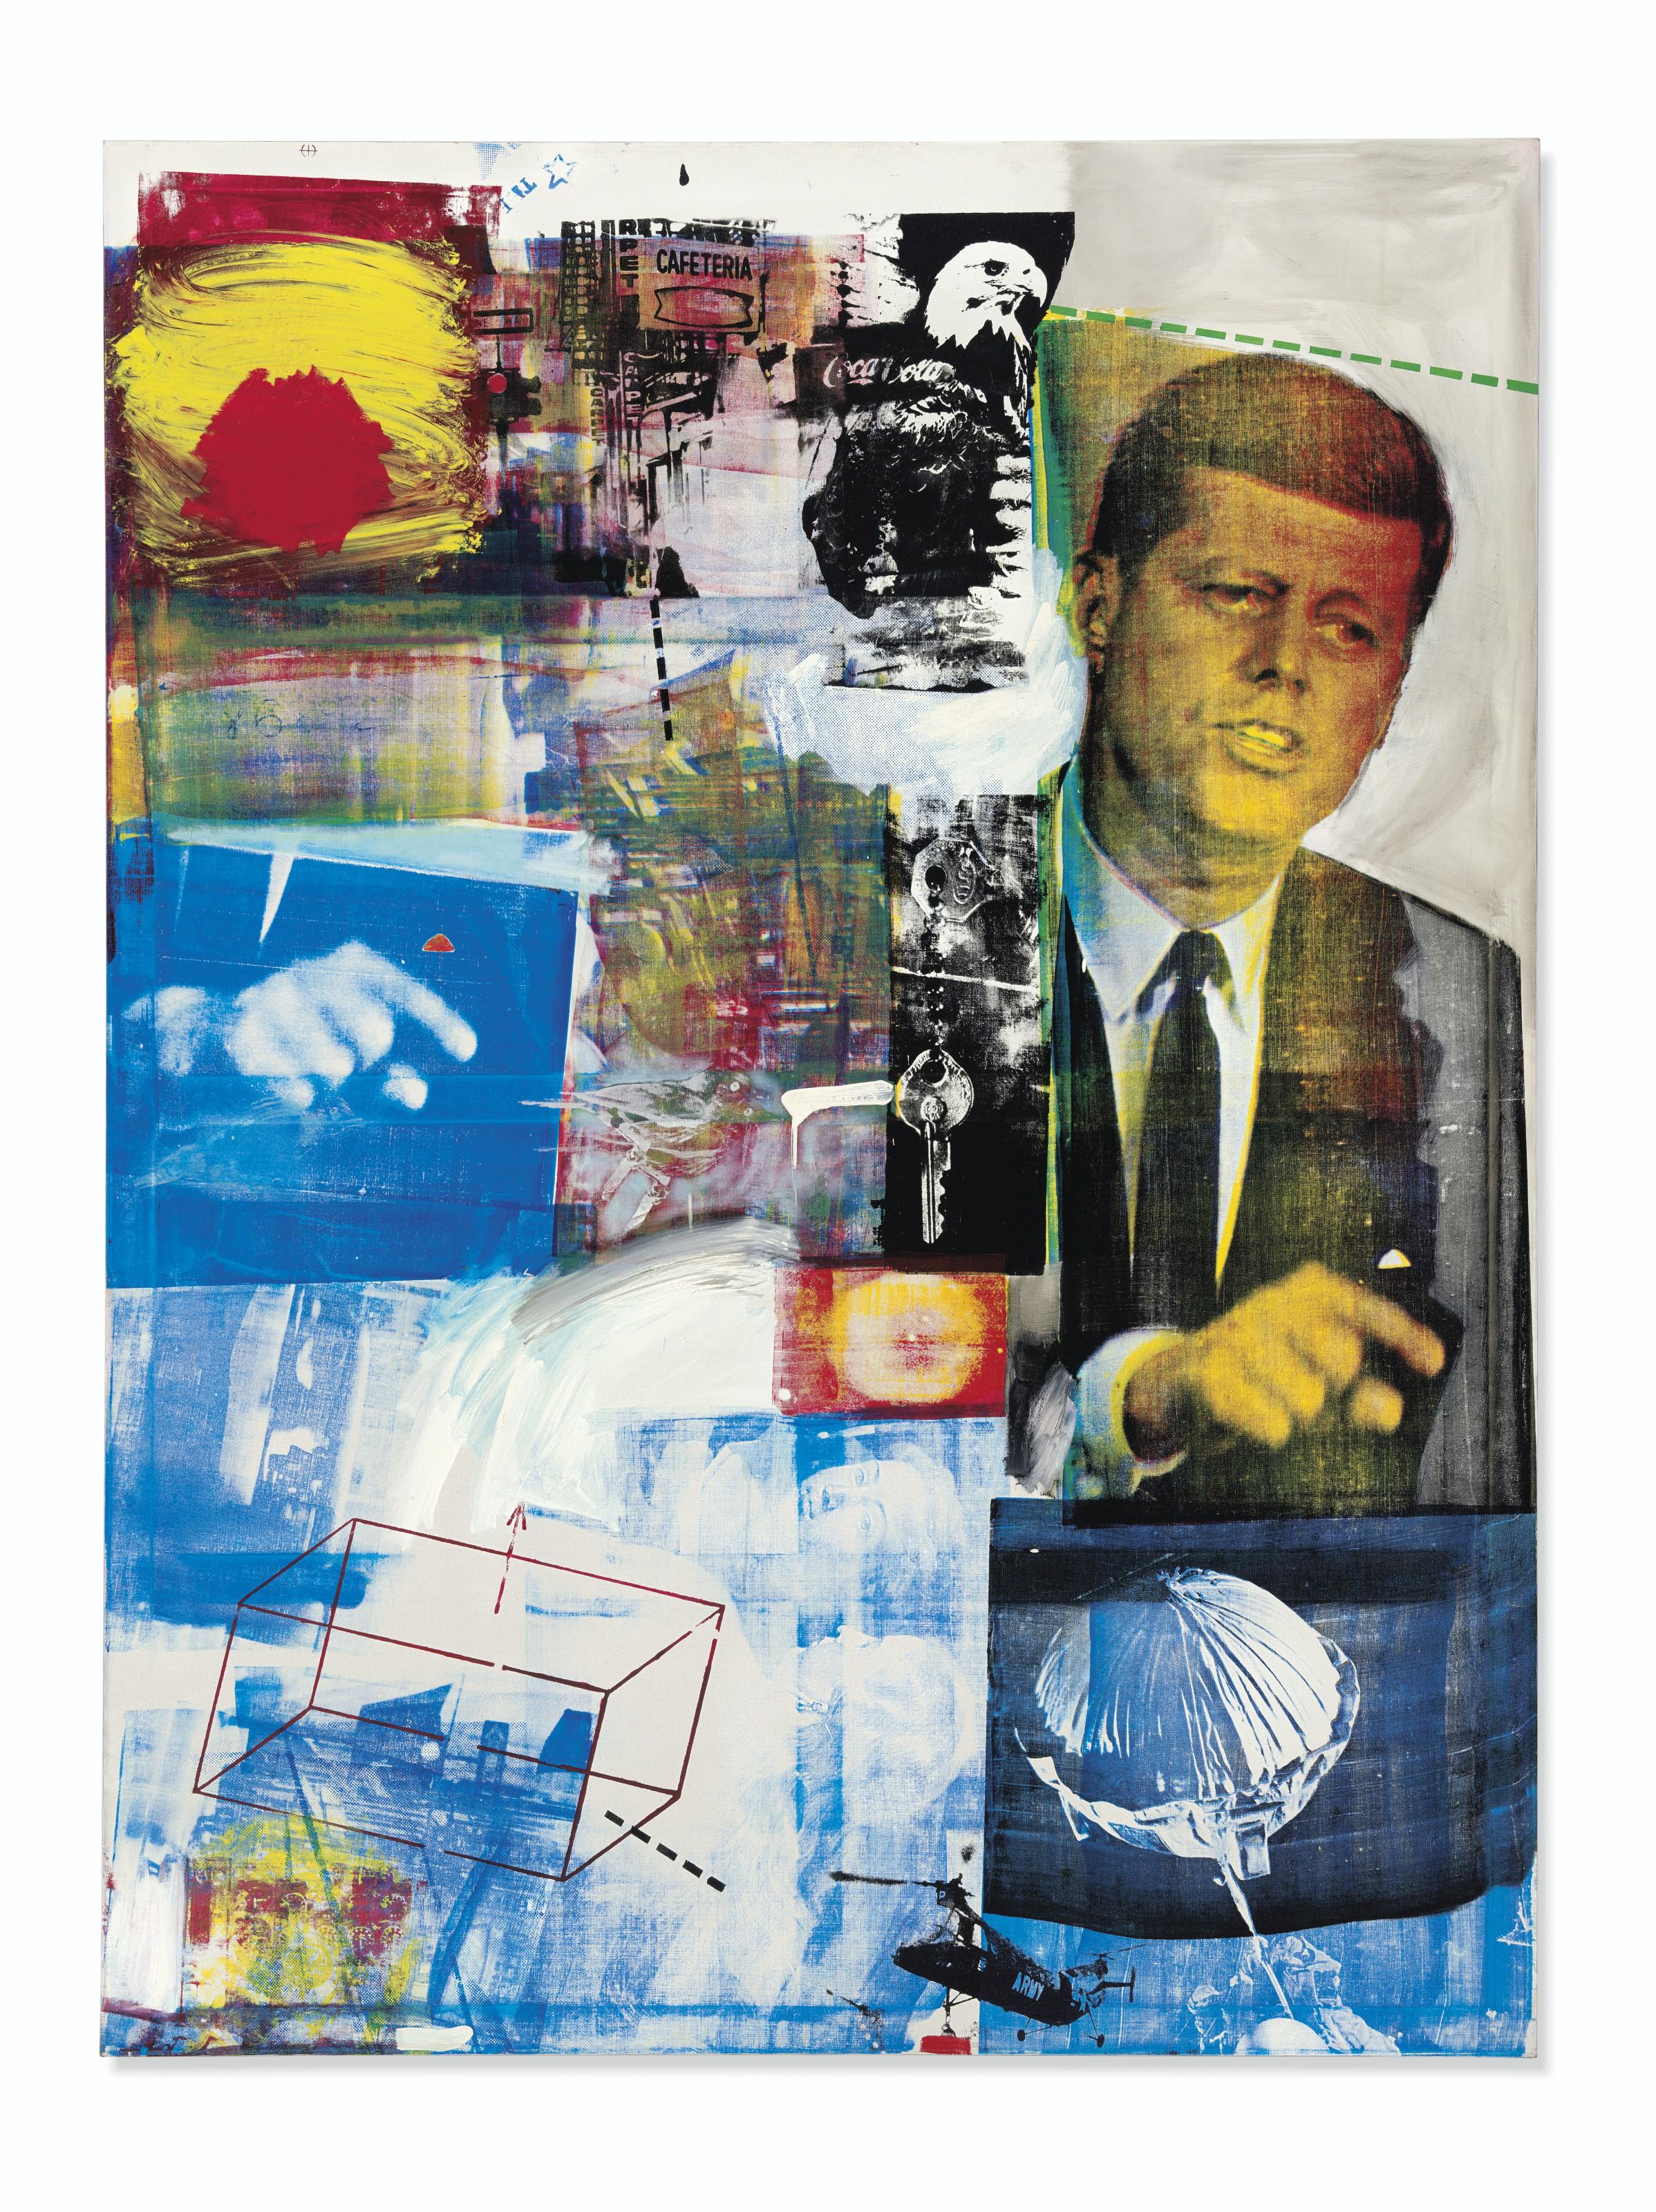 Robert Rauschenberg, Buffalo II, 1964, image © 2019 Robert Rauschenberg Foundation : Licensed by VAGA at Artists Right Society (ARS), New York via Christie's